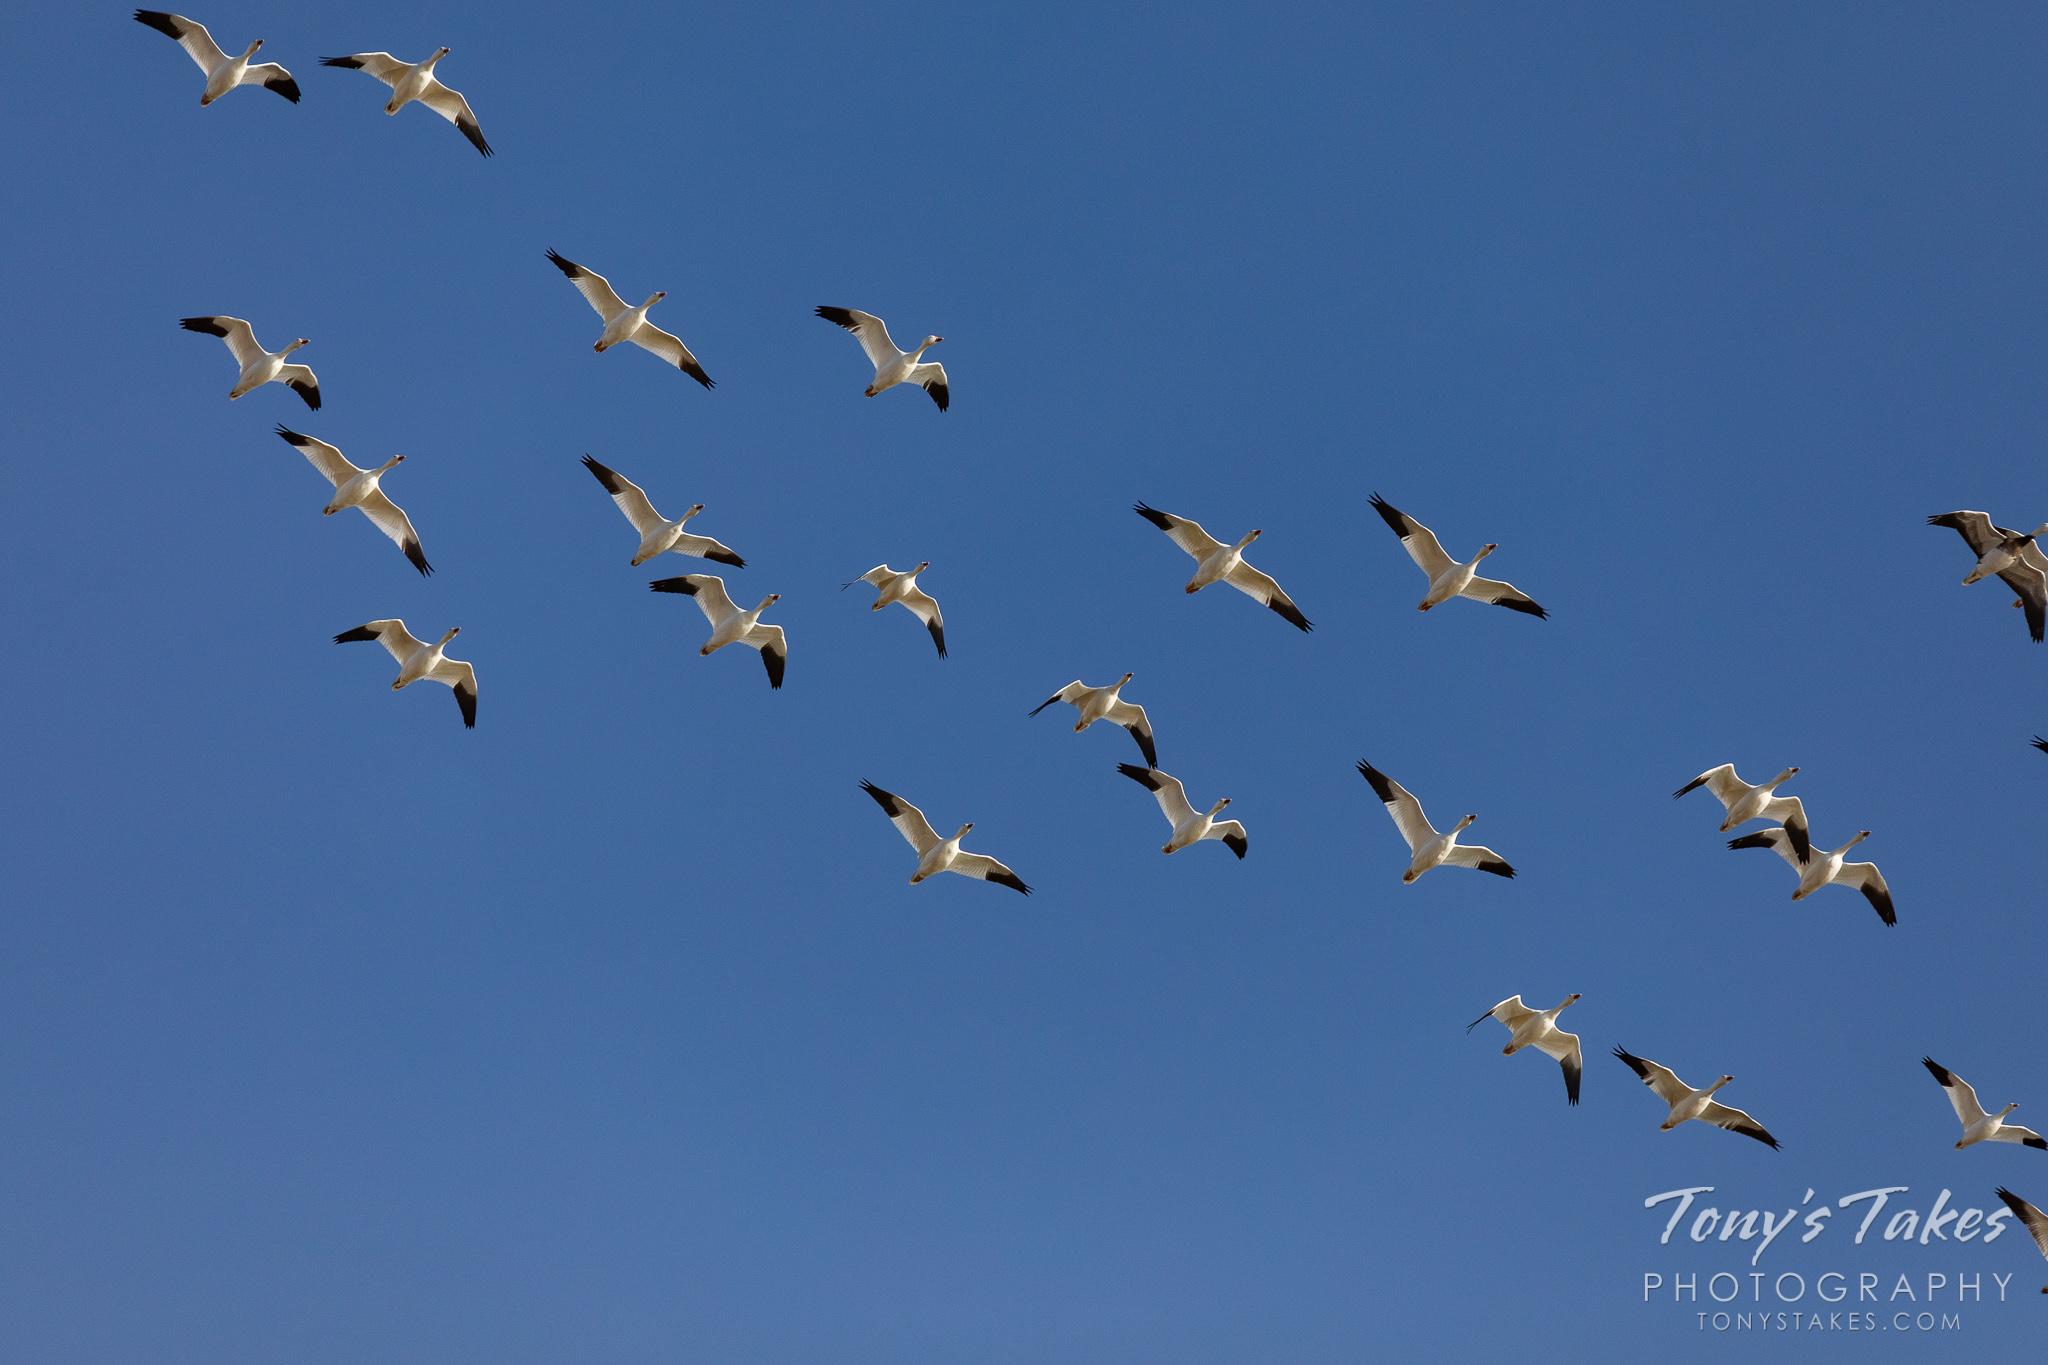 Snow geese migrating through